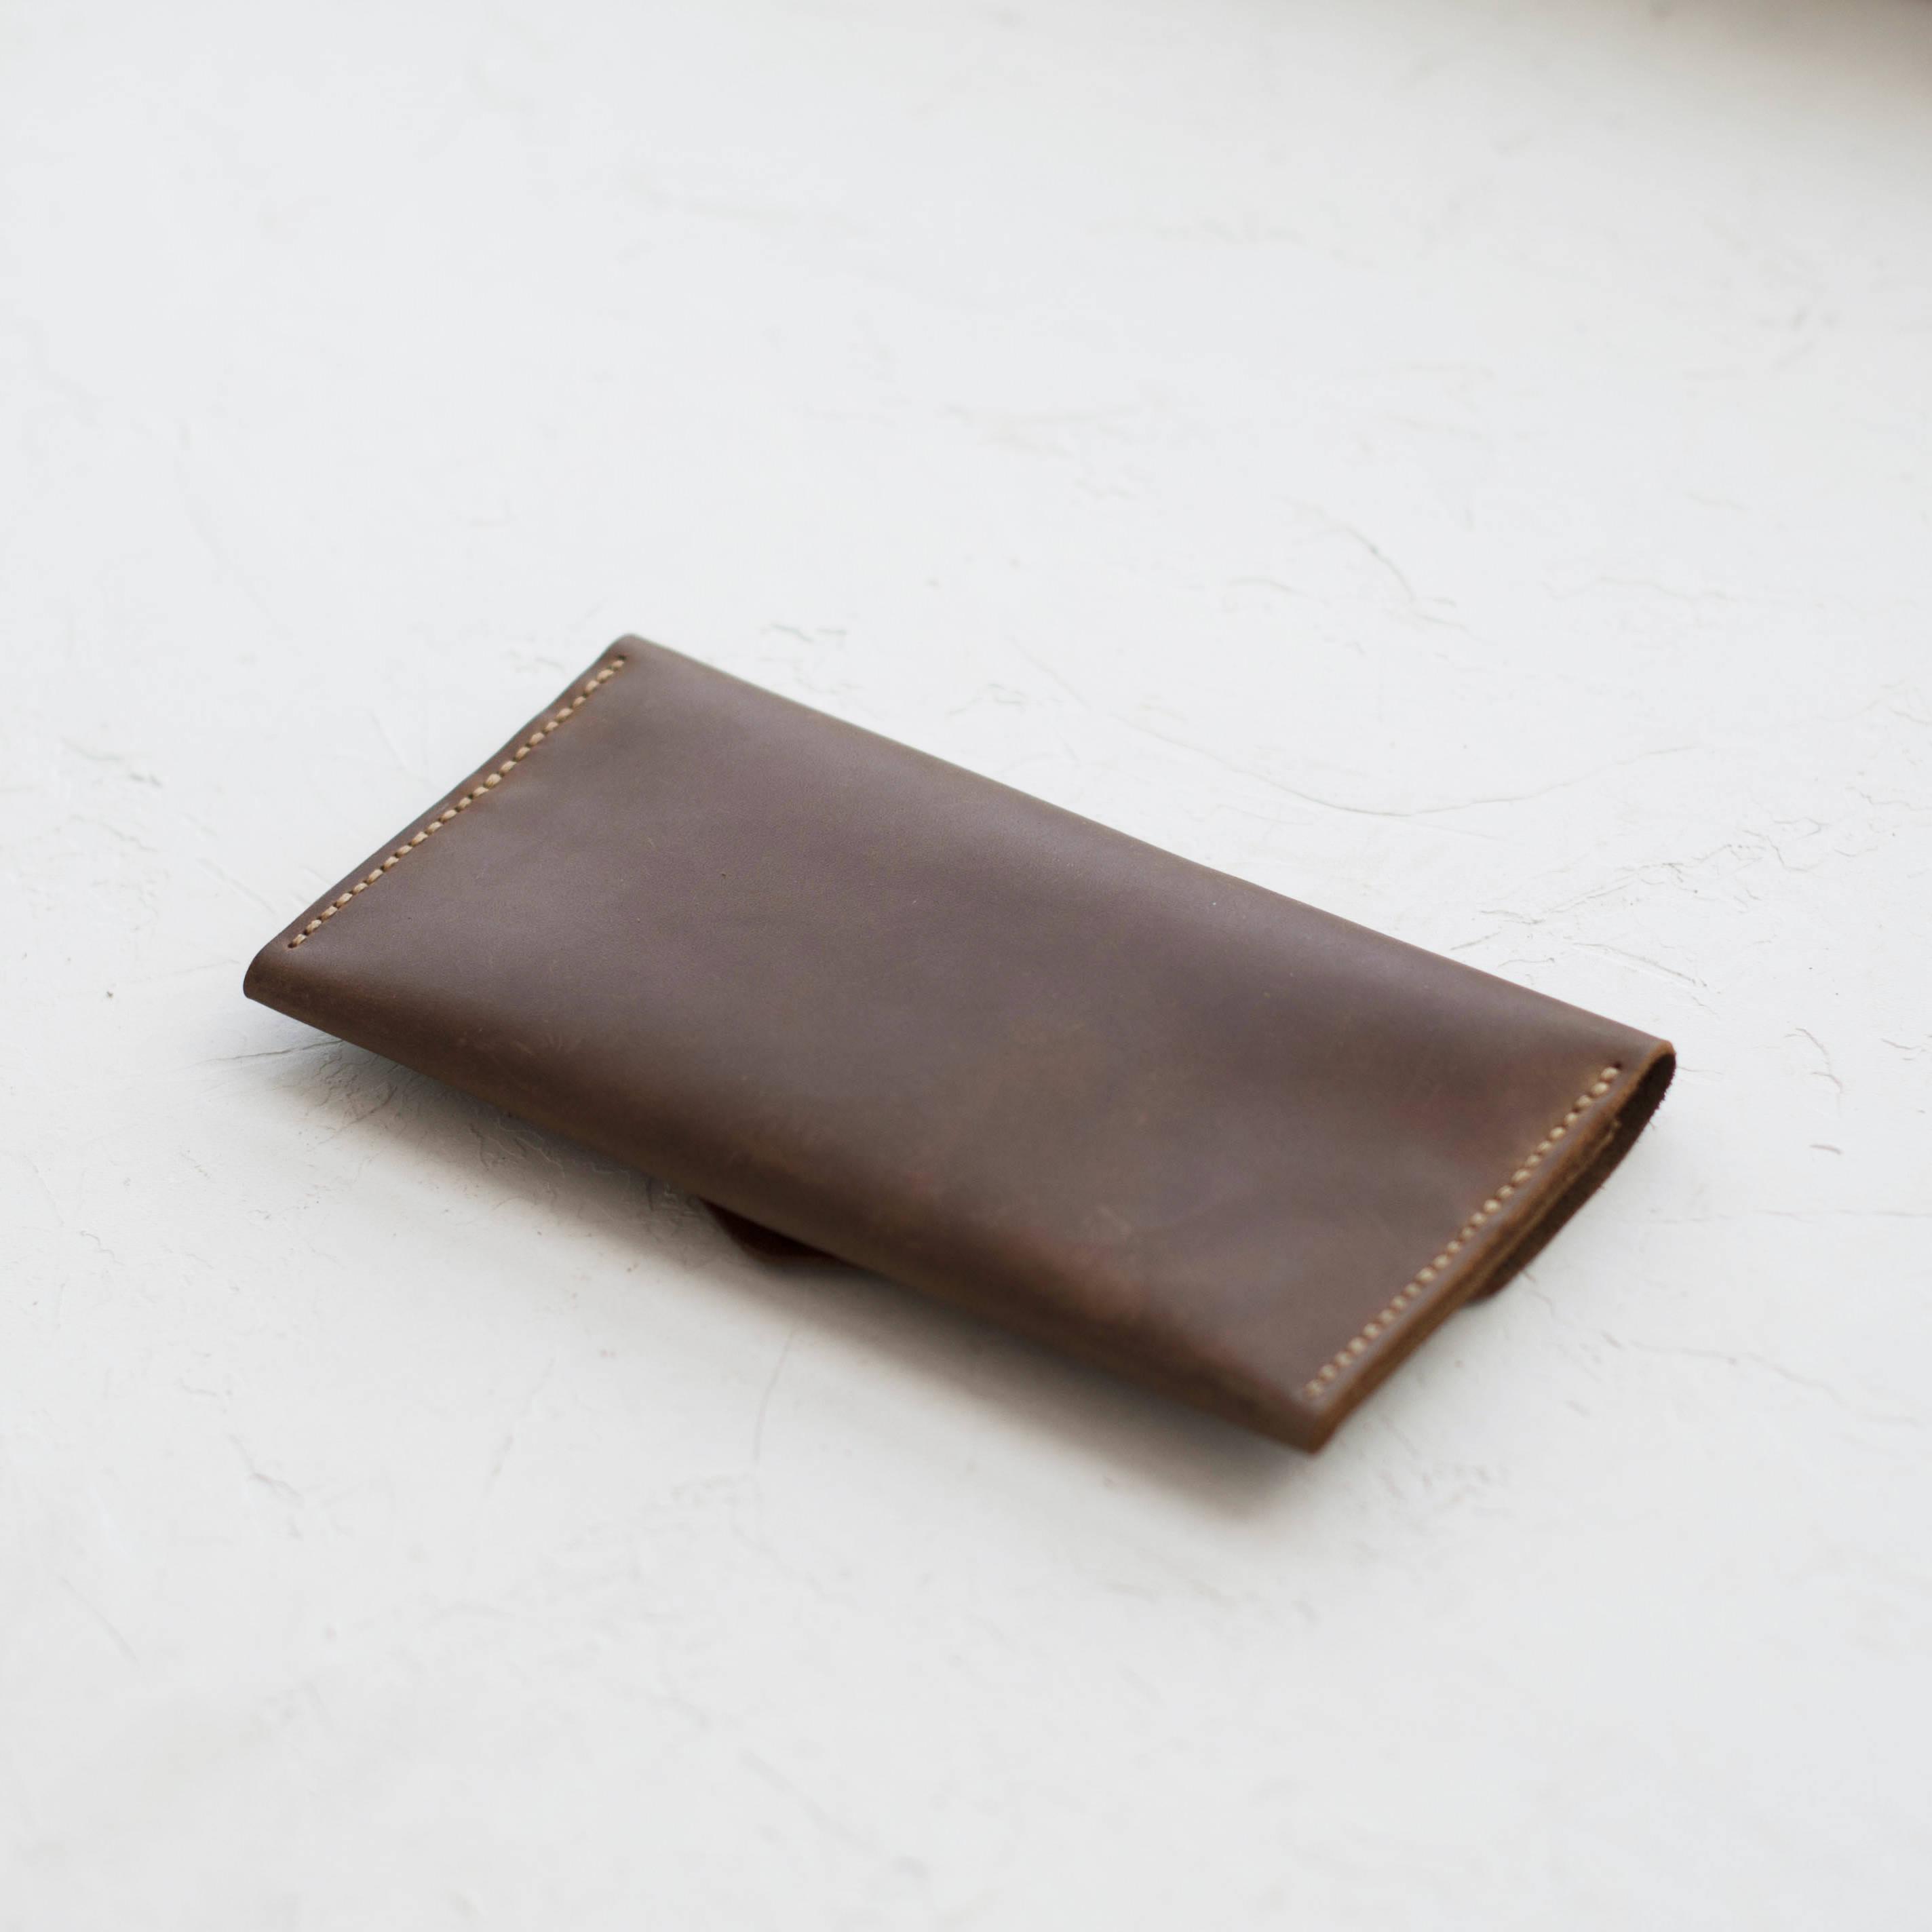 40967934a5536 Leather travel wallet Leather wallet men Mens long wallet Wallet card  holder Buy wallet Card wallet Travel document holder